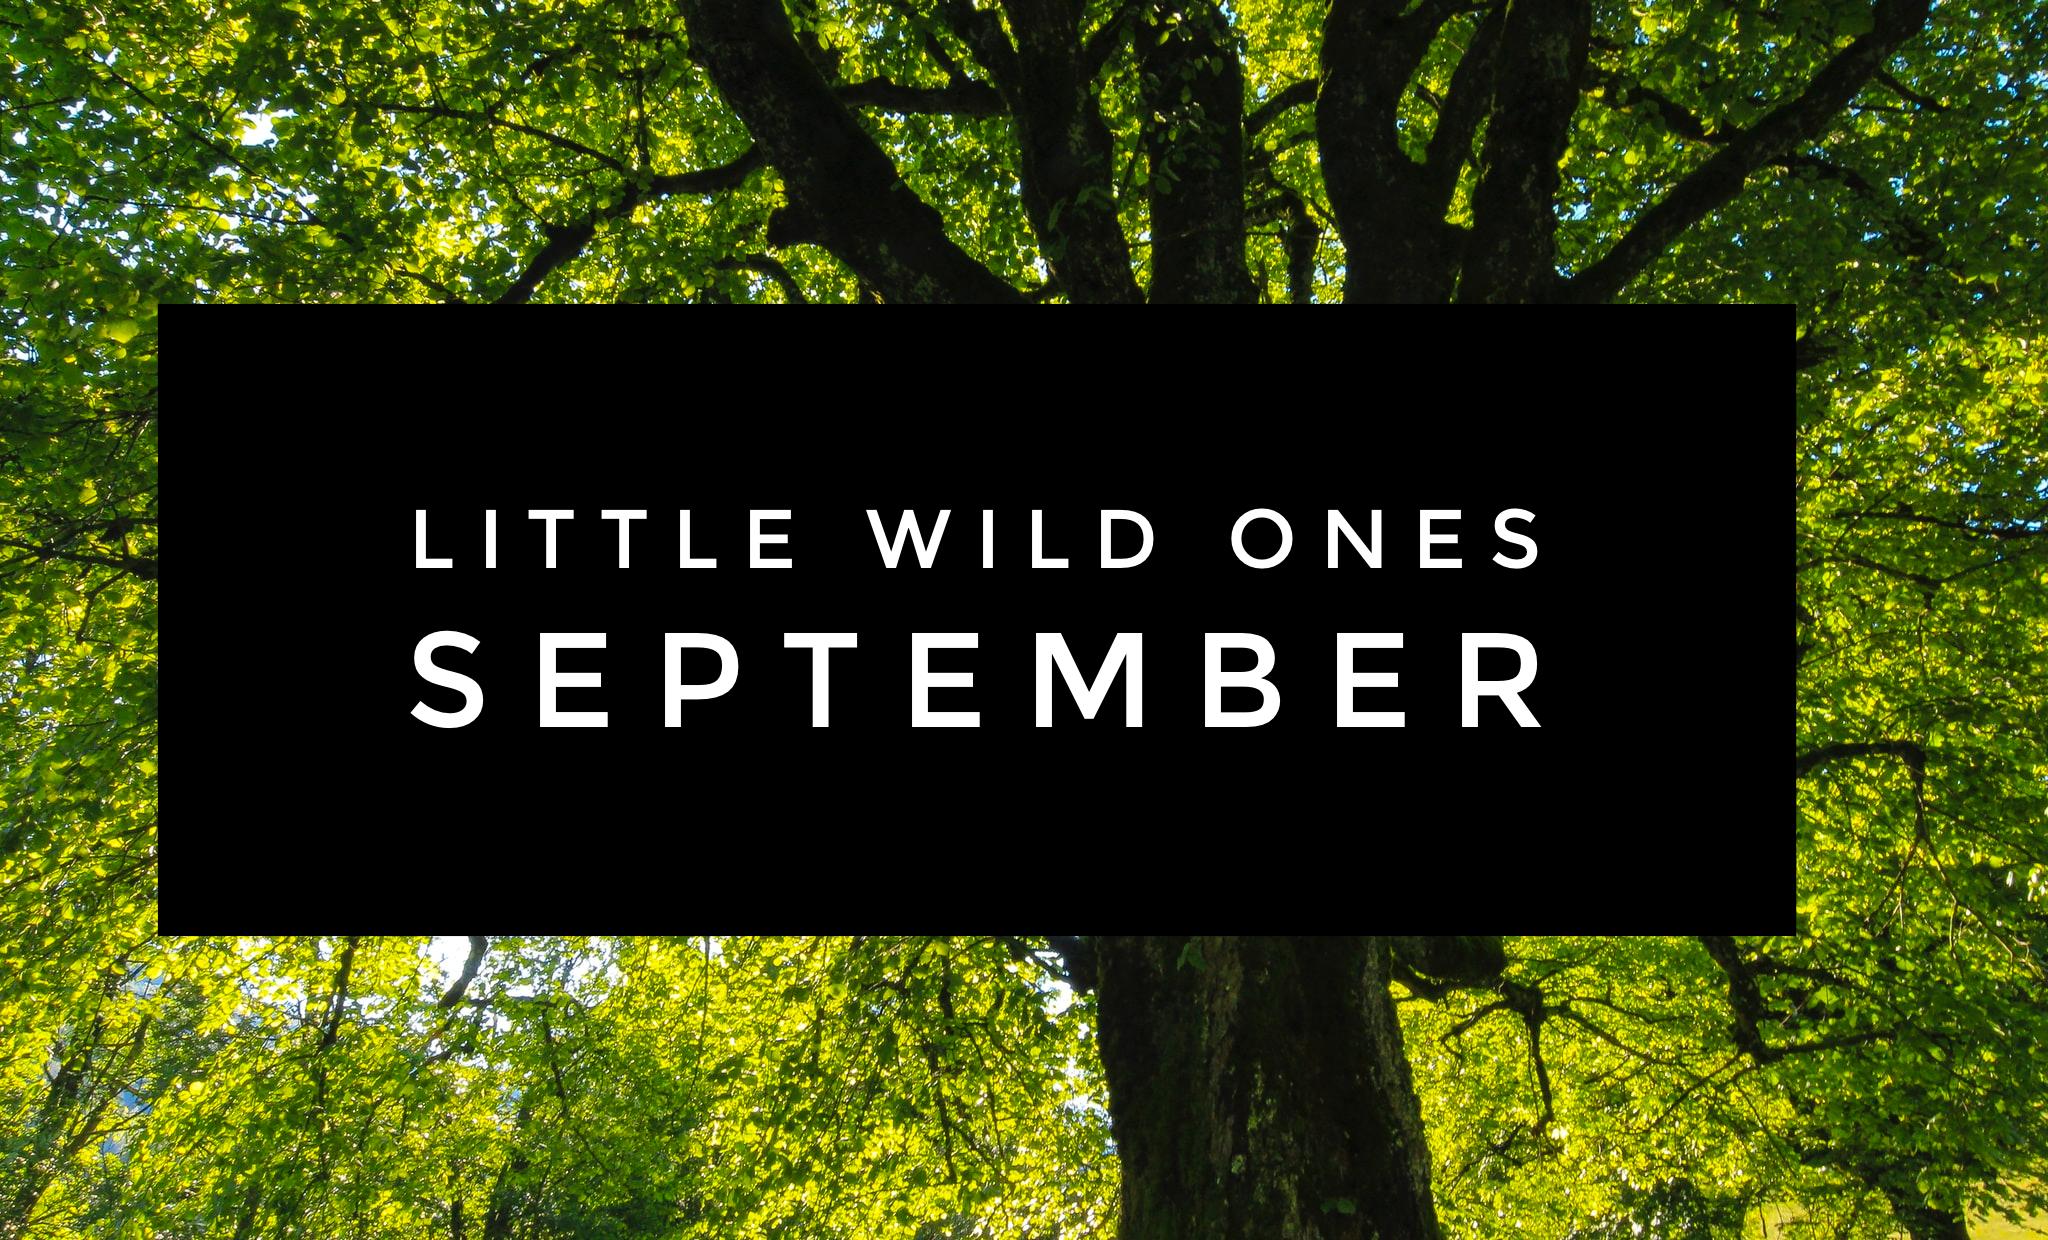 Little Wild Ones - Timbernook of Northeast Oklahoma